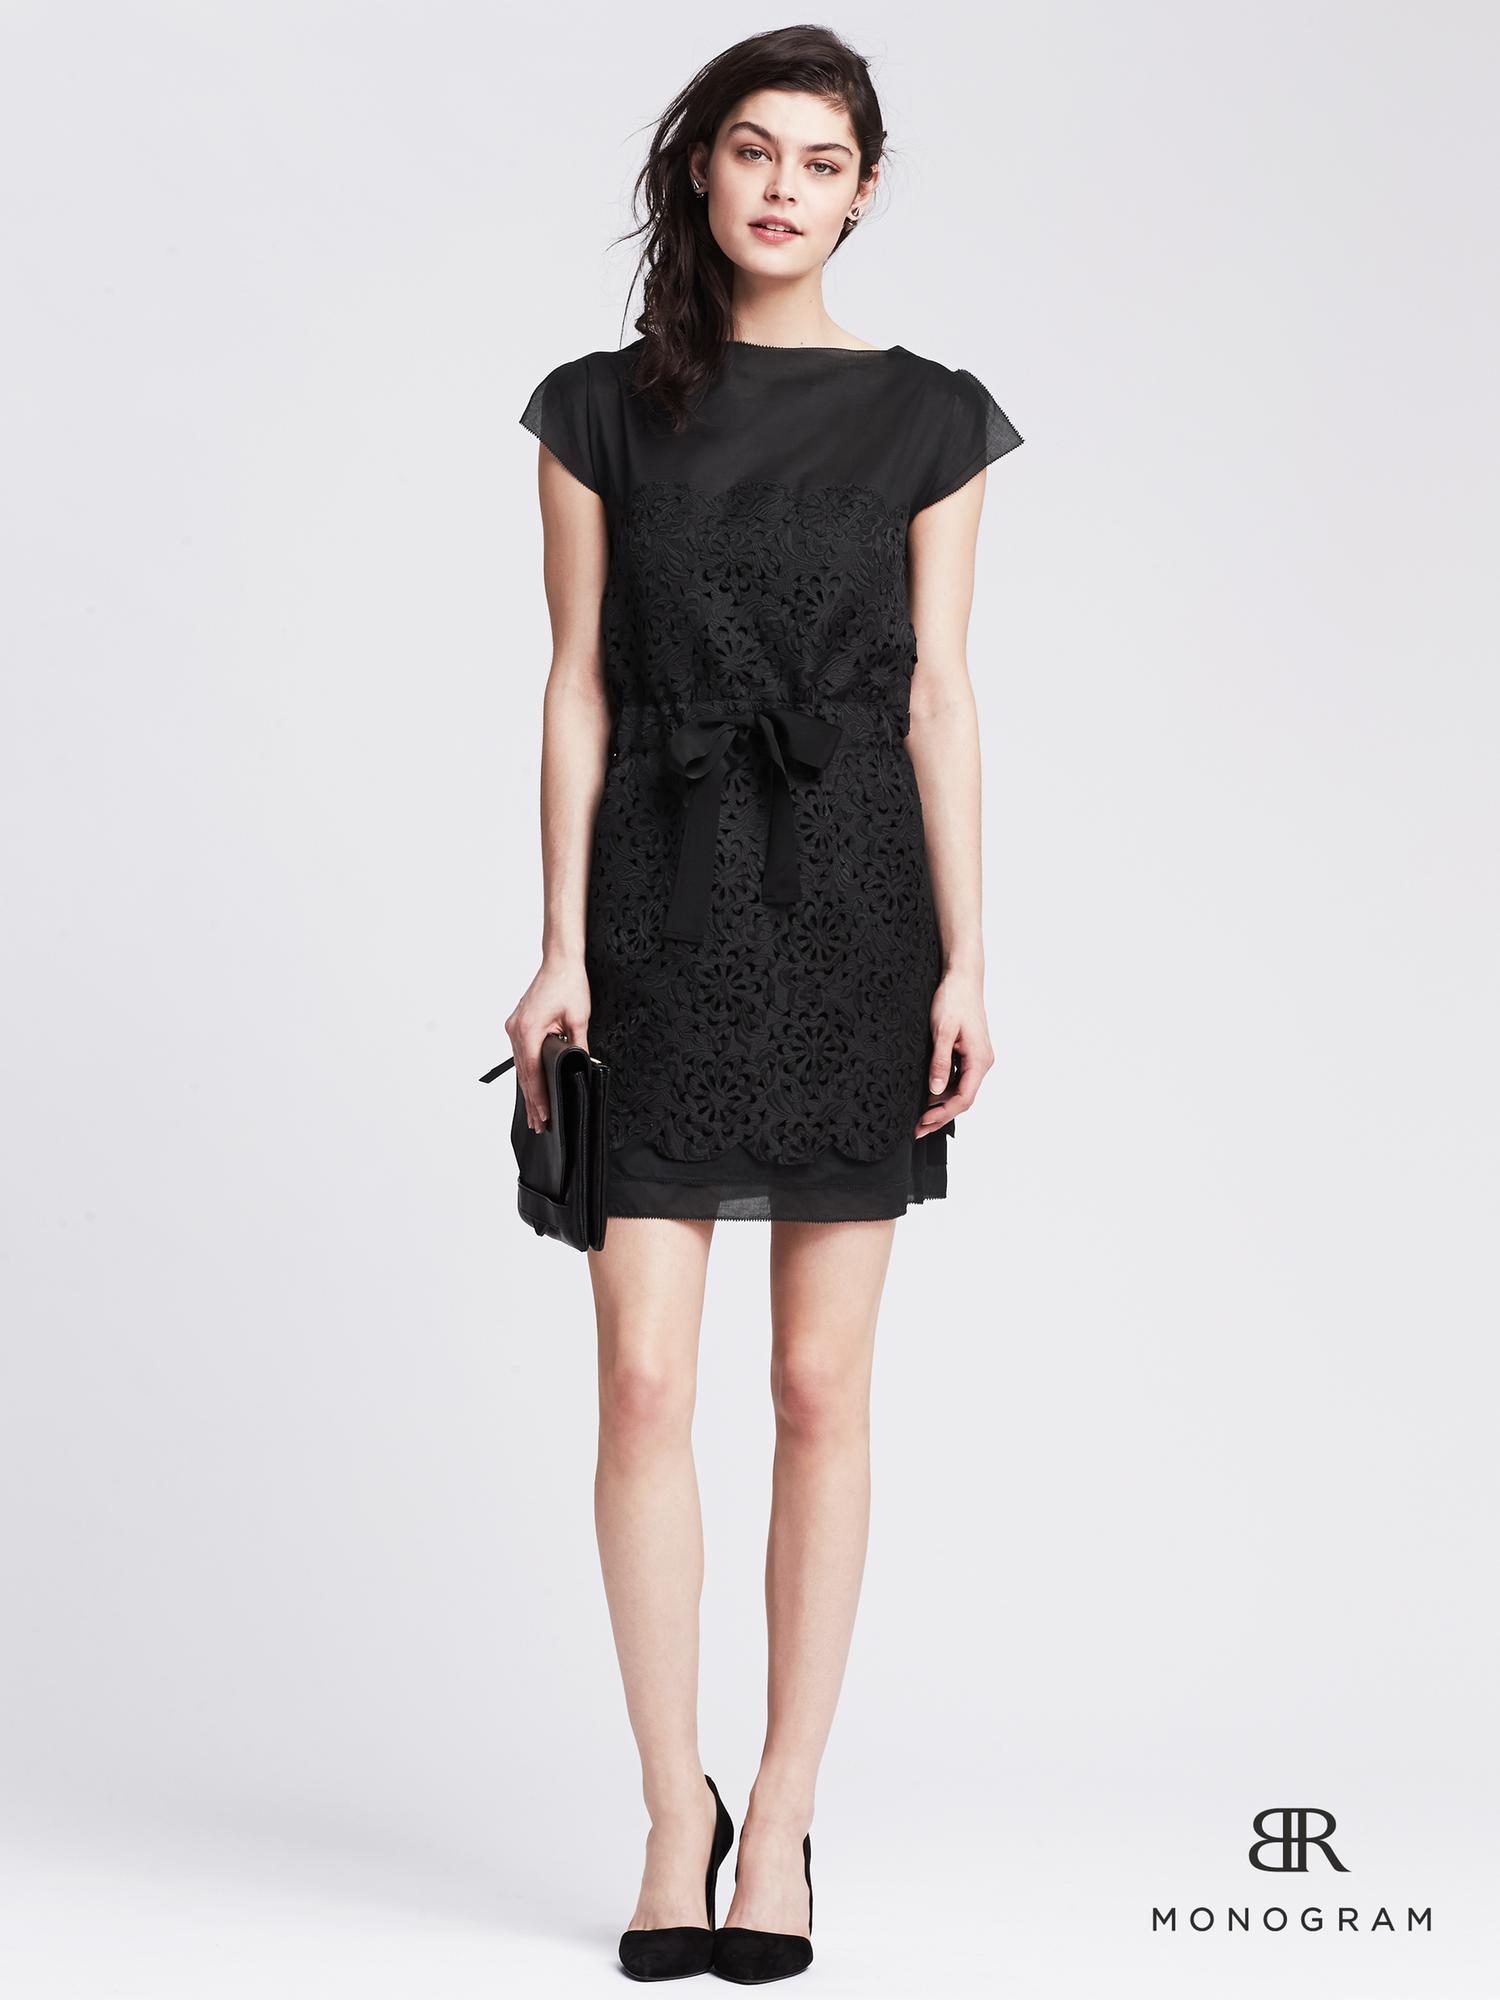 Lyst Banana Republic Br Monogram Cutout Lace Dress In Black